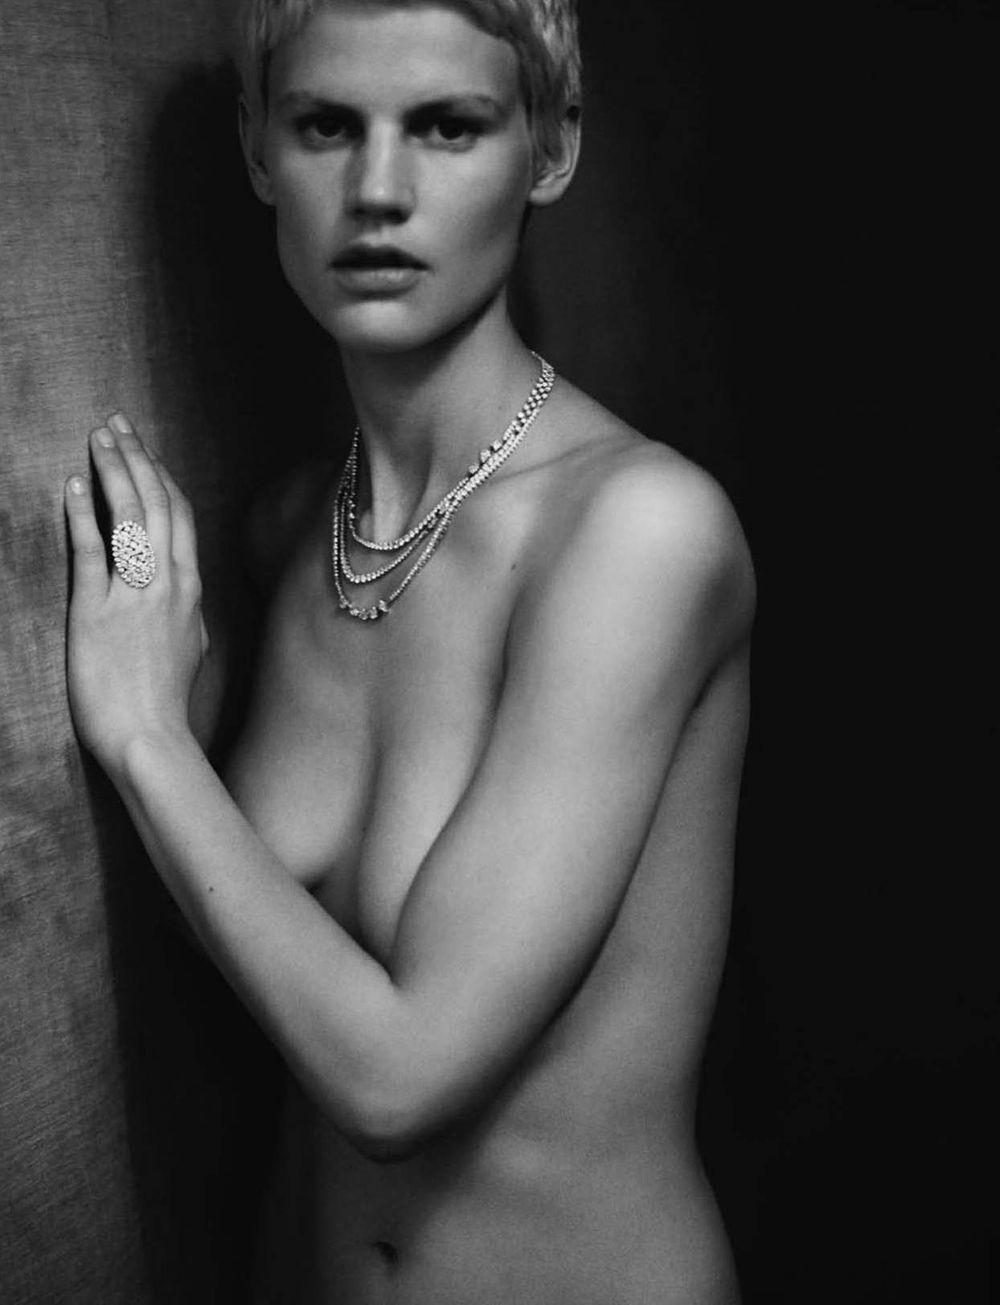 Model leaked nude